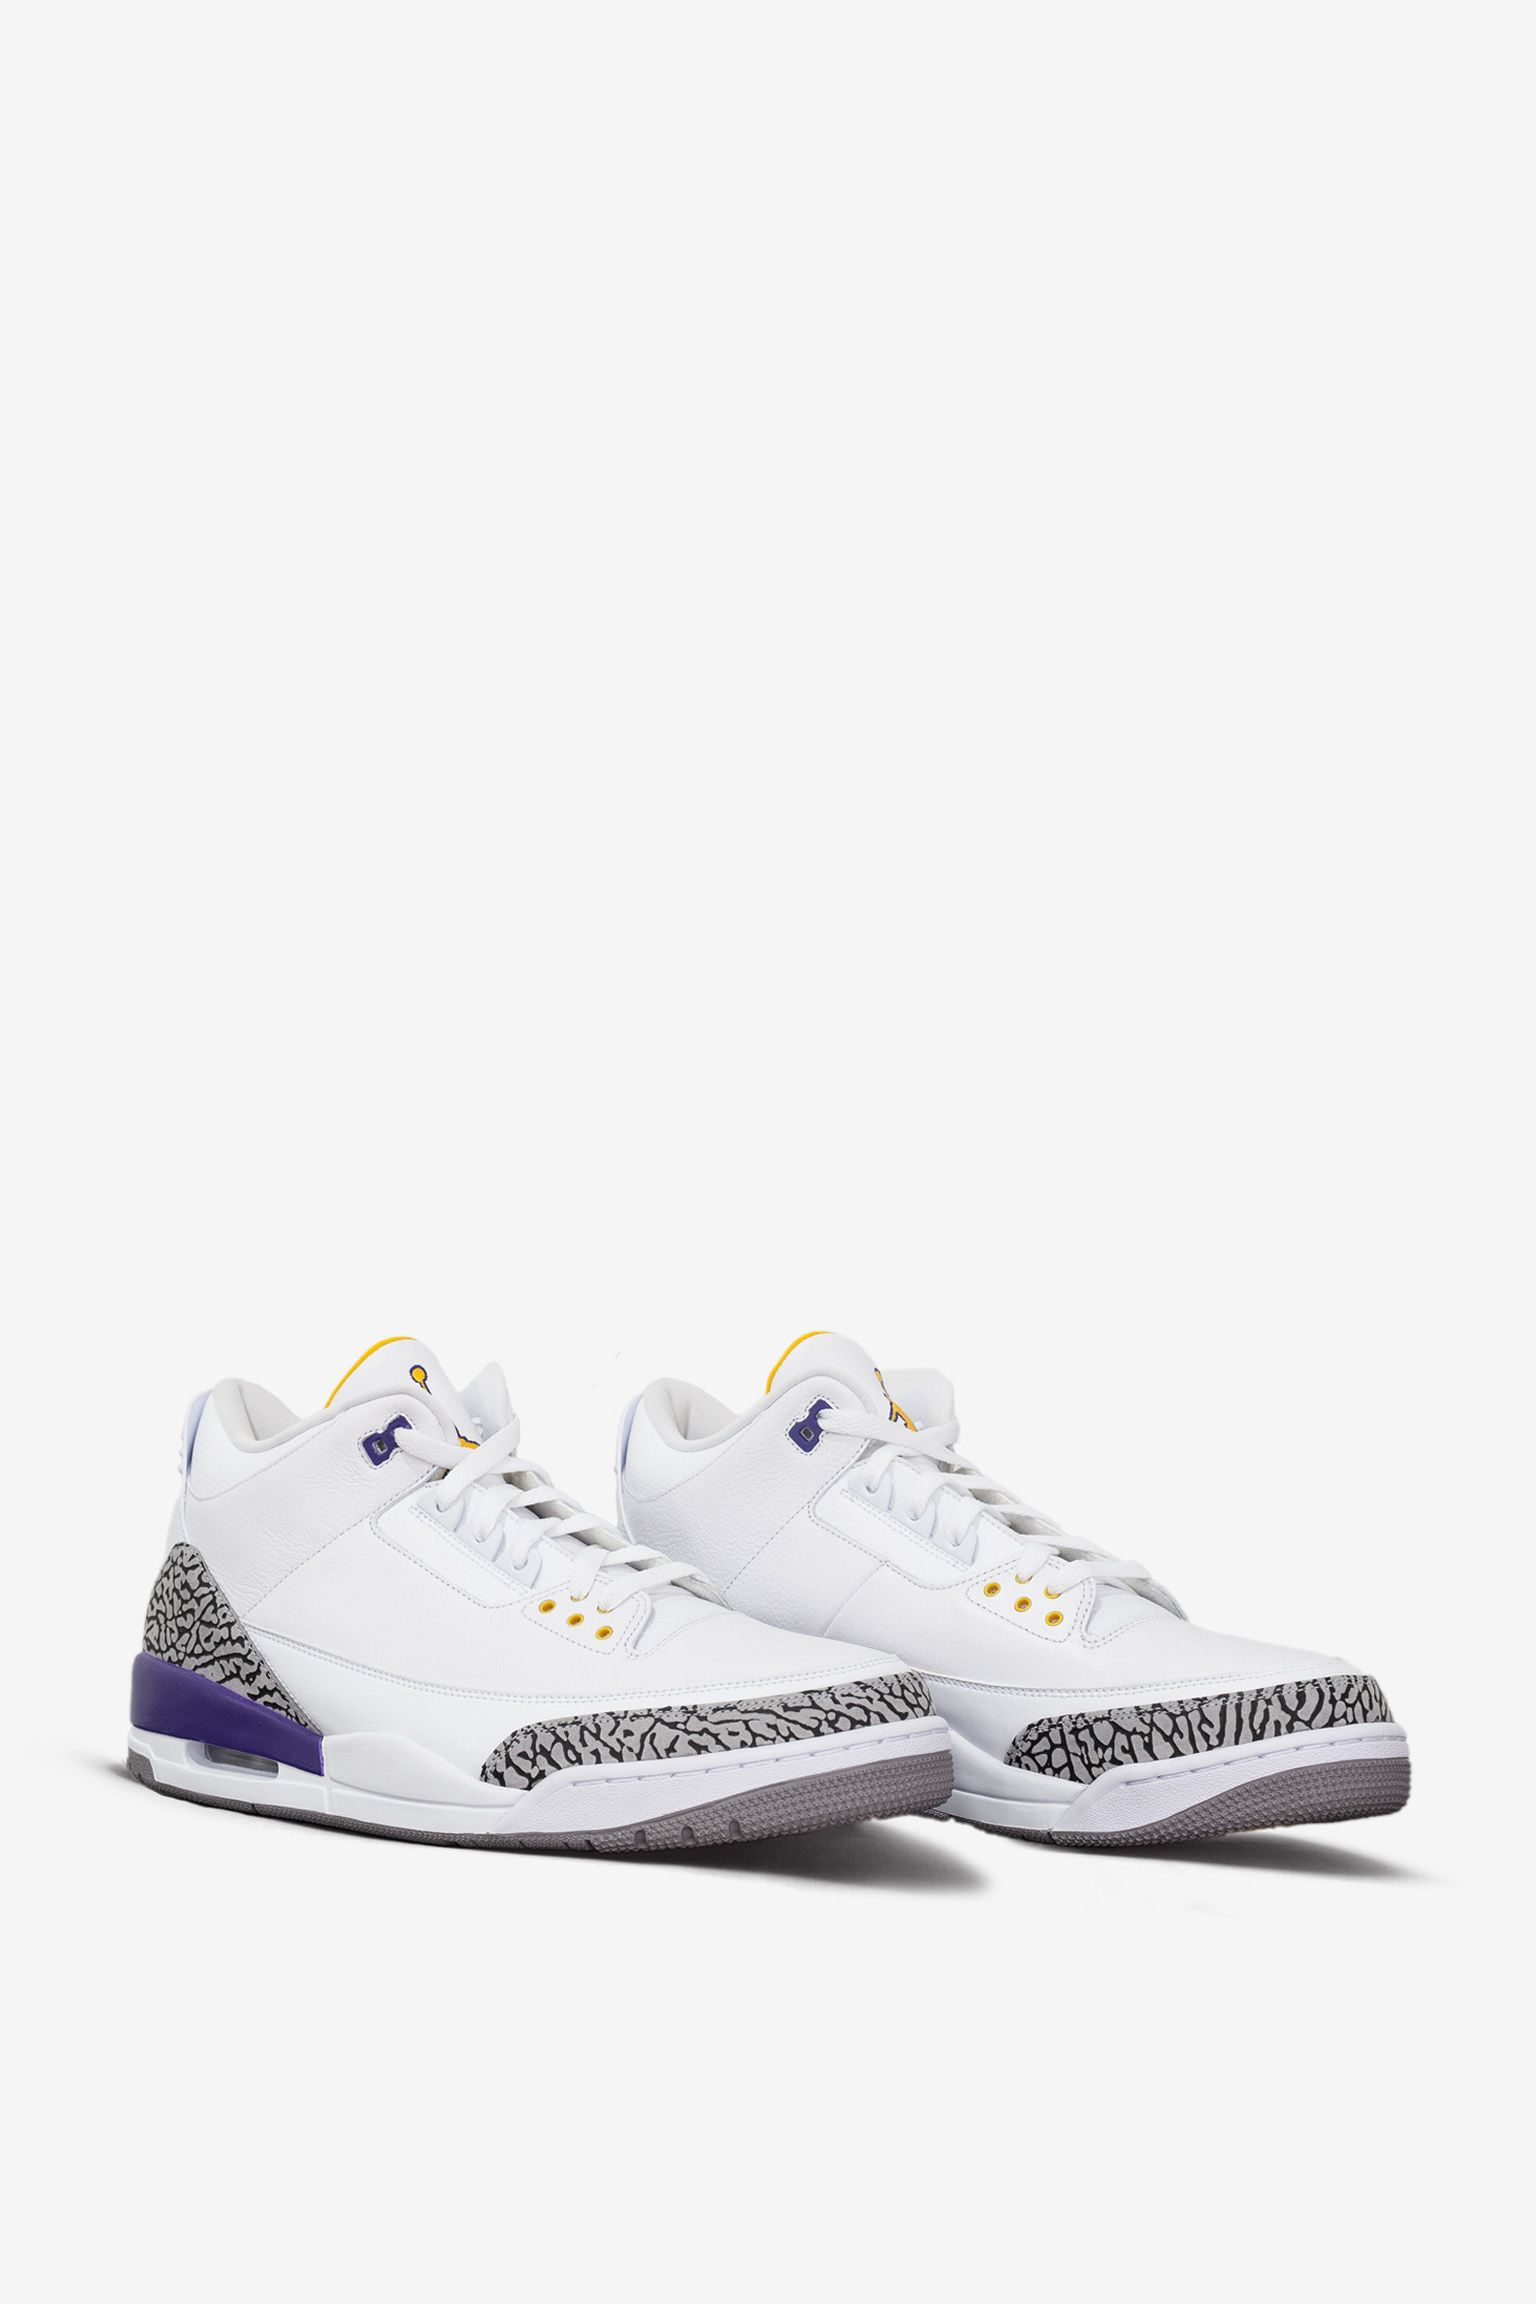 Tributo del marchio Jordan a Kobe Bryant